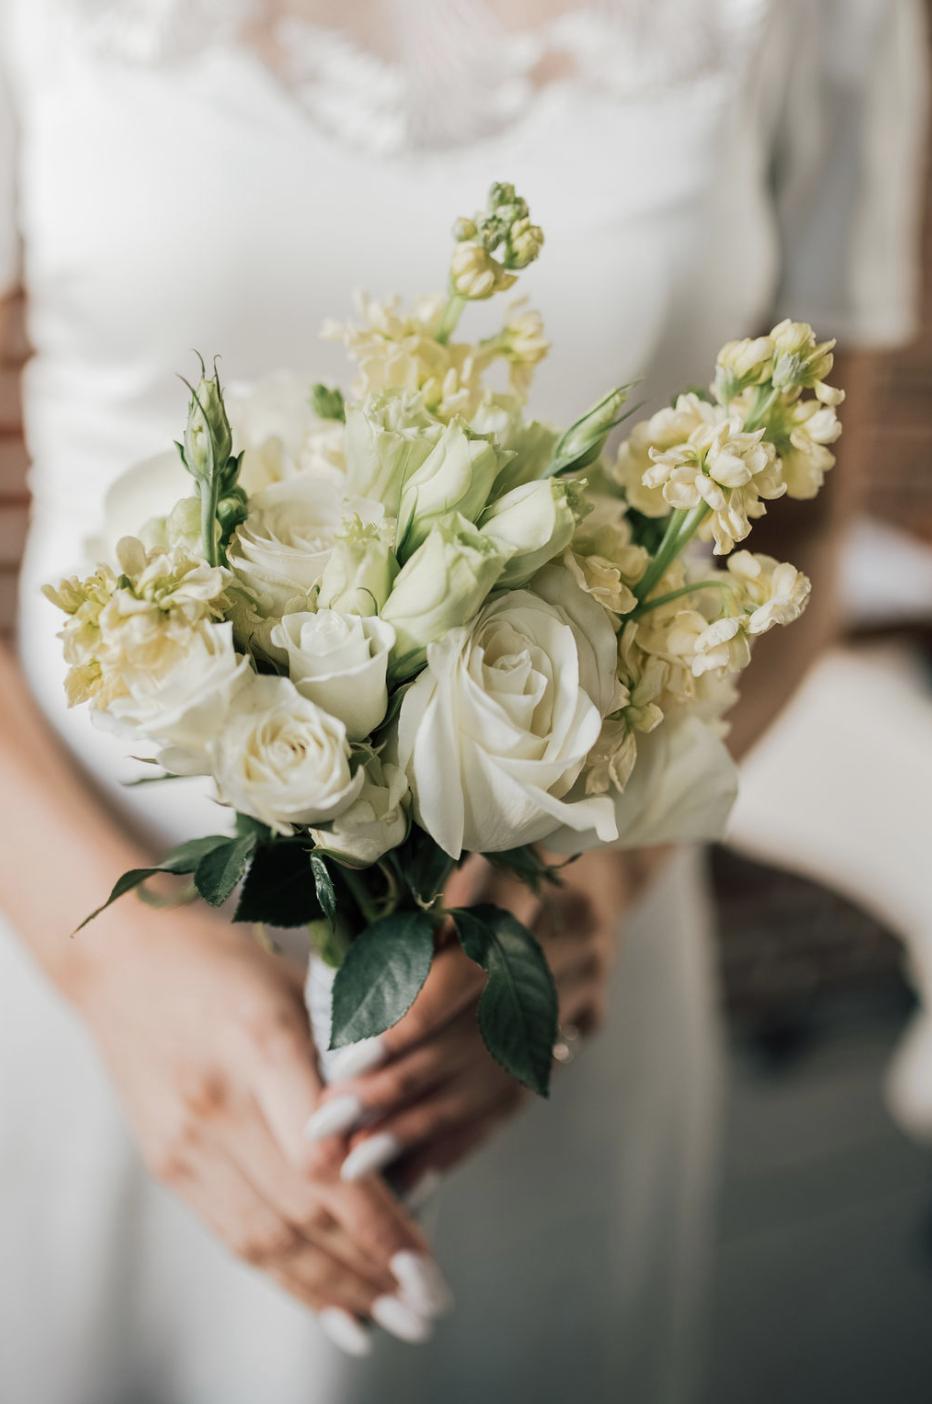 Wedding Bouquet Laurel Creative In 2020 Spring Wedding Bouquets New York Wedding Flower Bouquet Wedding